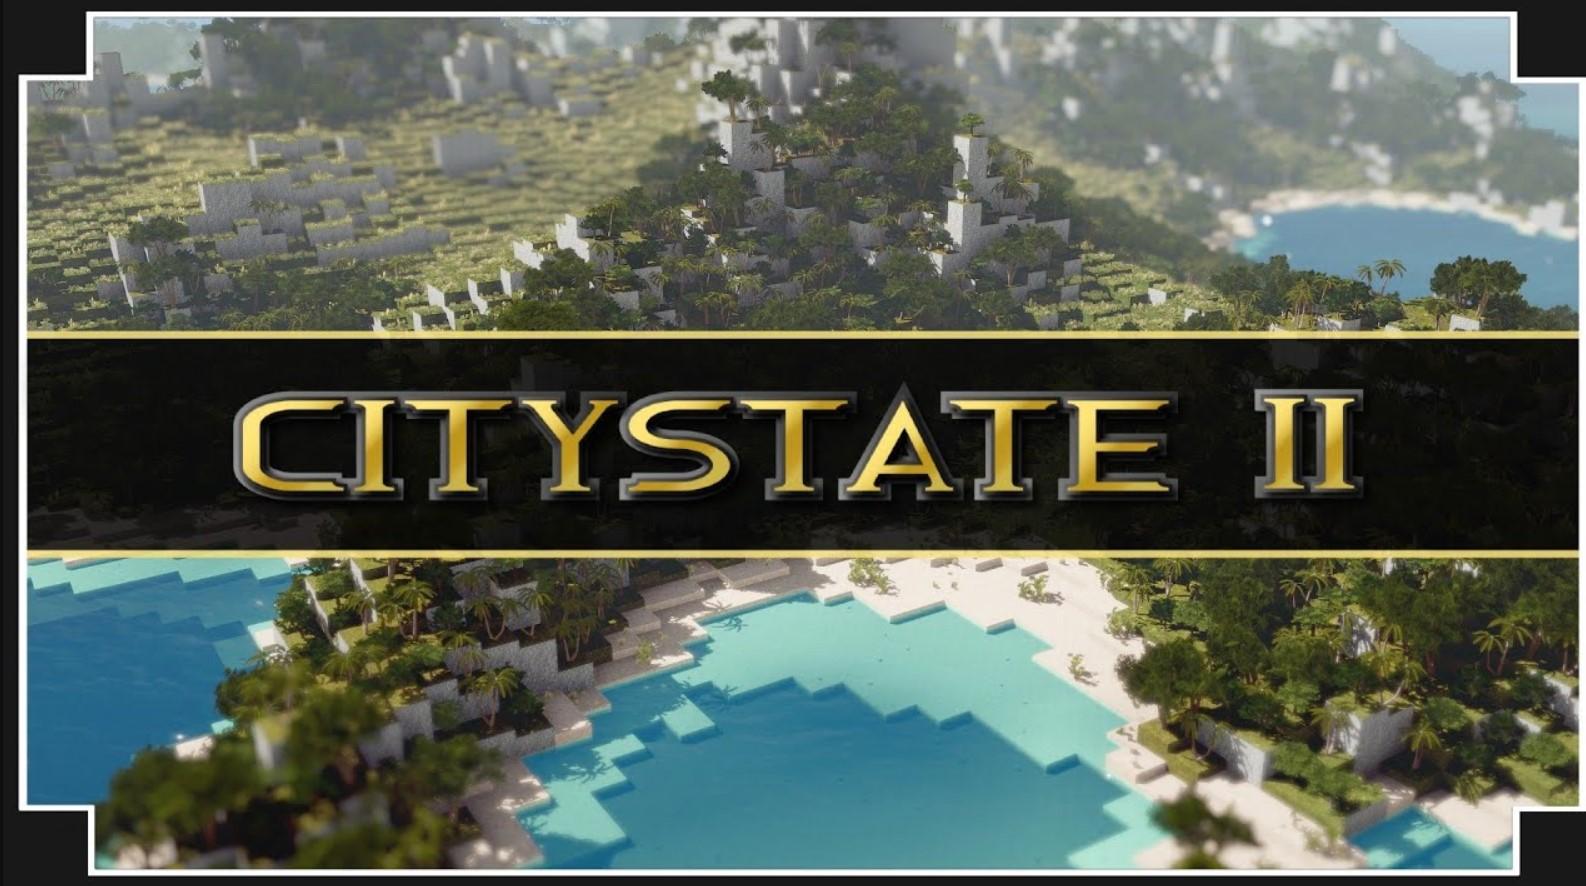 Citystate 2 Full Version Free Download PC